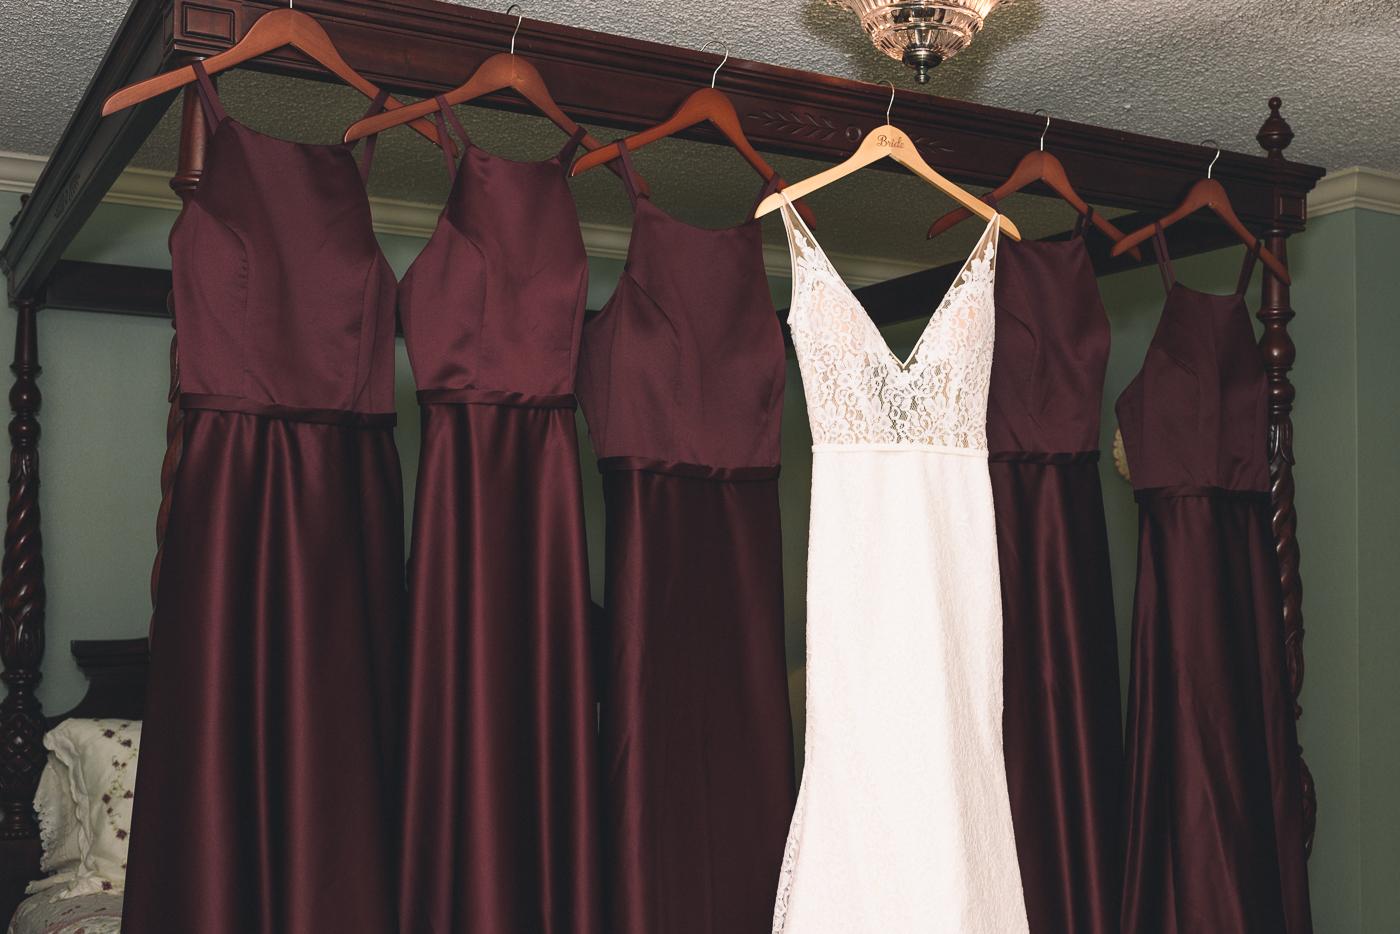 wedding gown white dress v-neck lace burgundy bride's maid's dresses